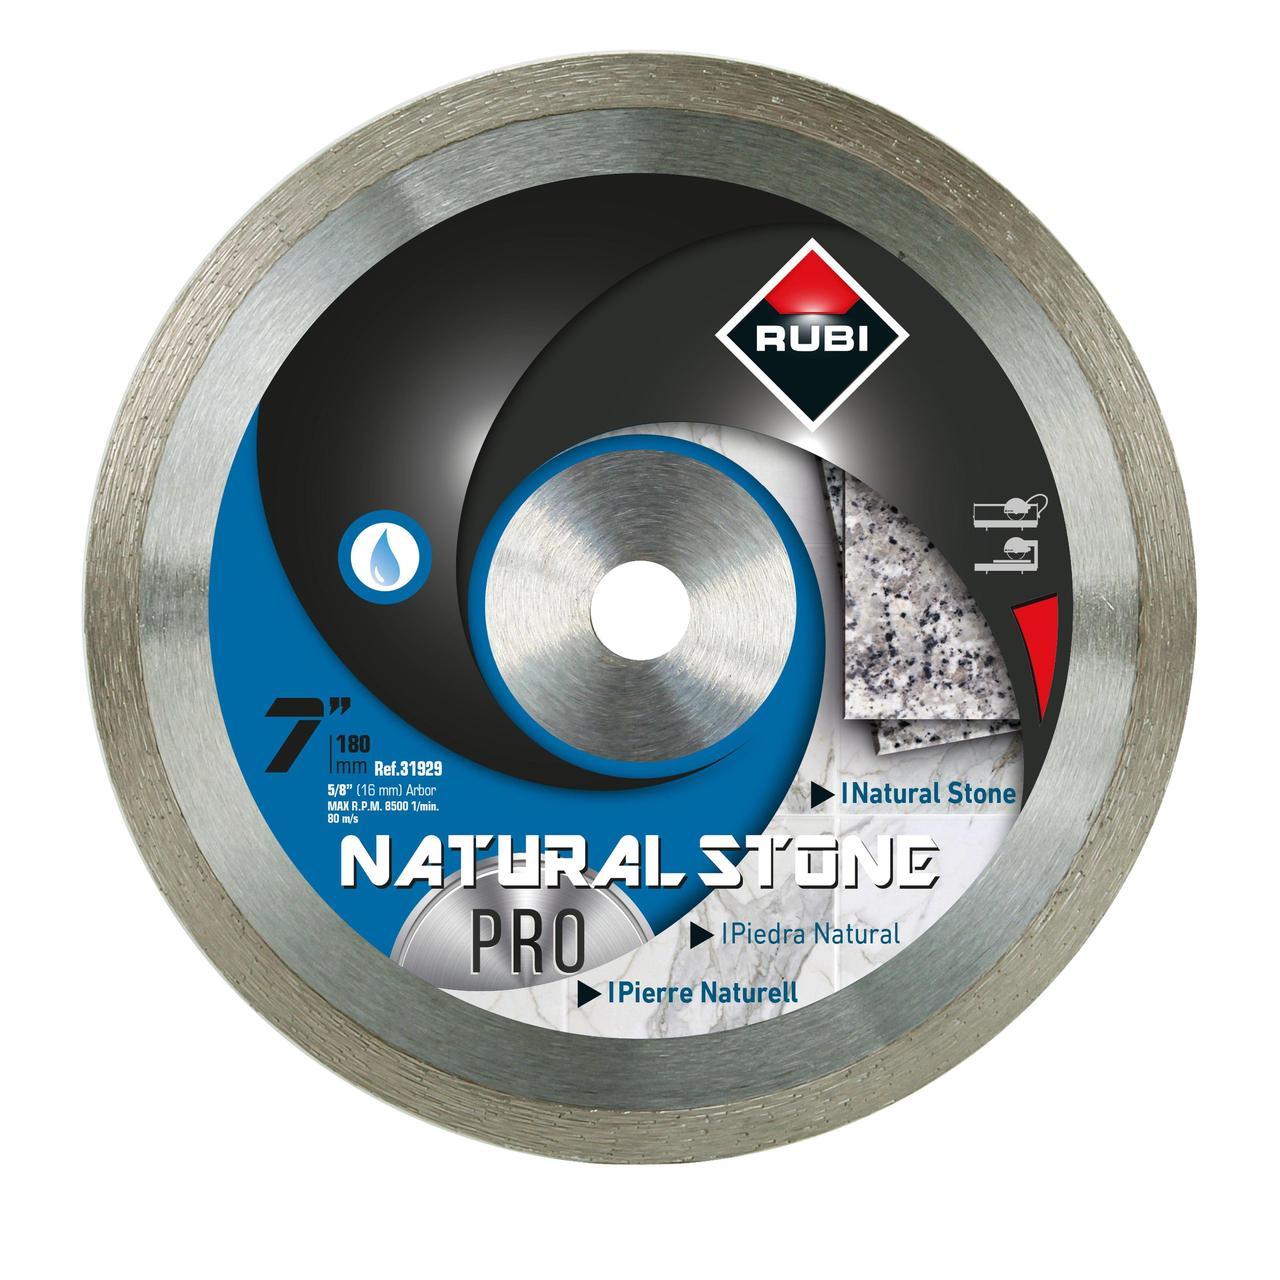 Natural Stone Diamond Blade Rubi Tools Usa